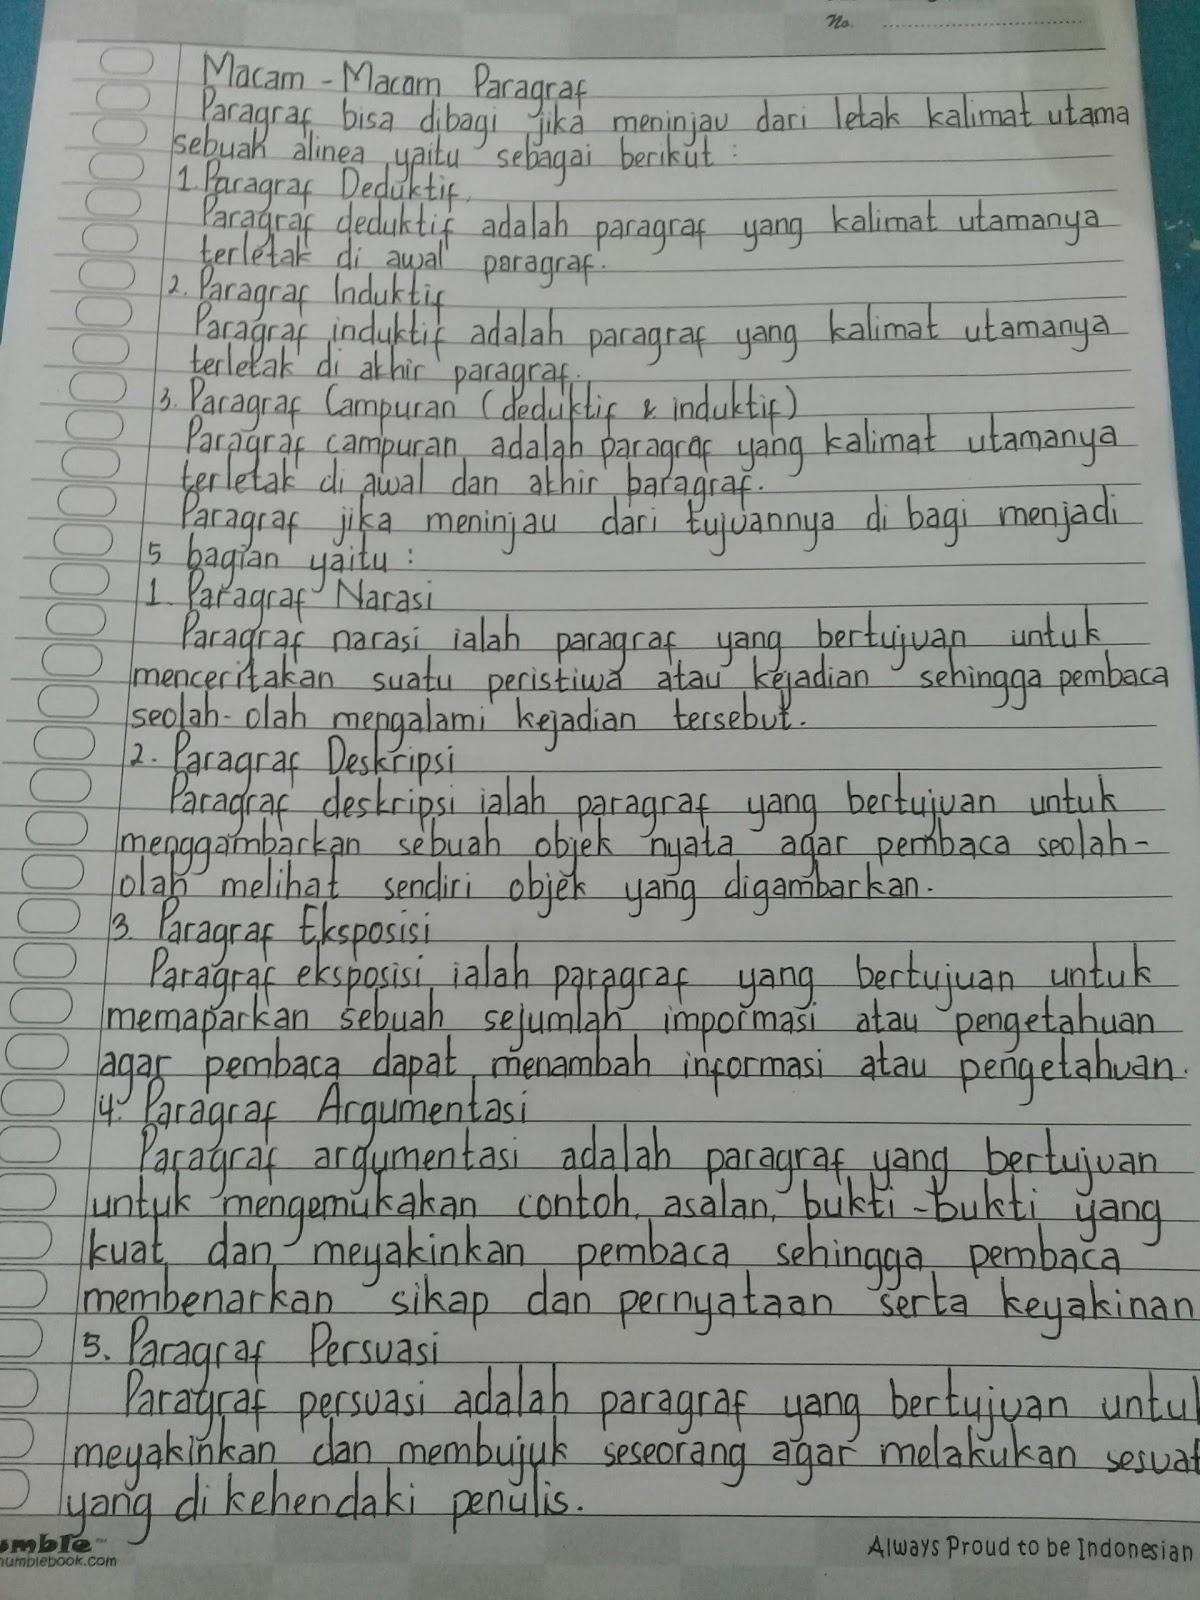 Jasa Tulis Tangan Bogor